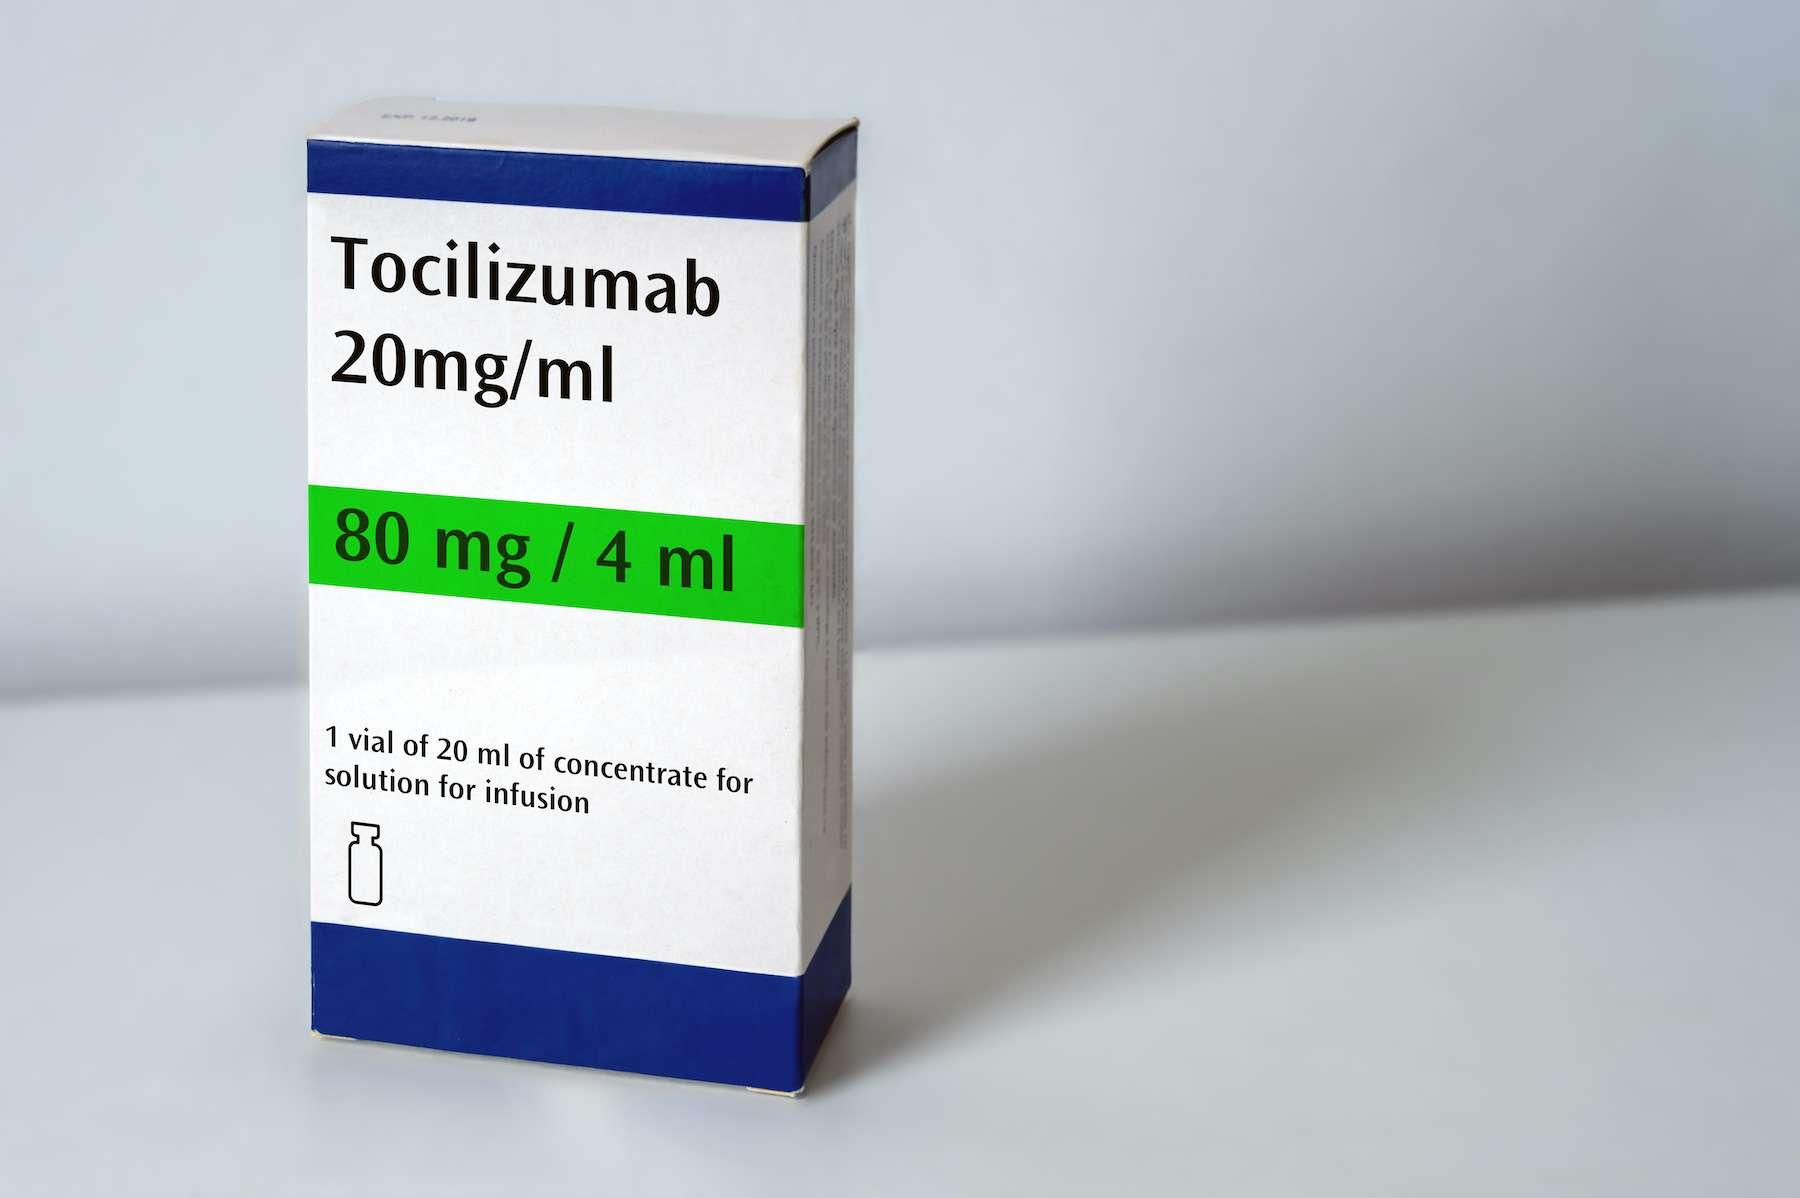 Le tocilizumab contrelaCovid-19 ?